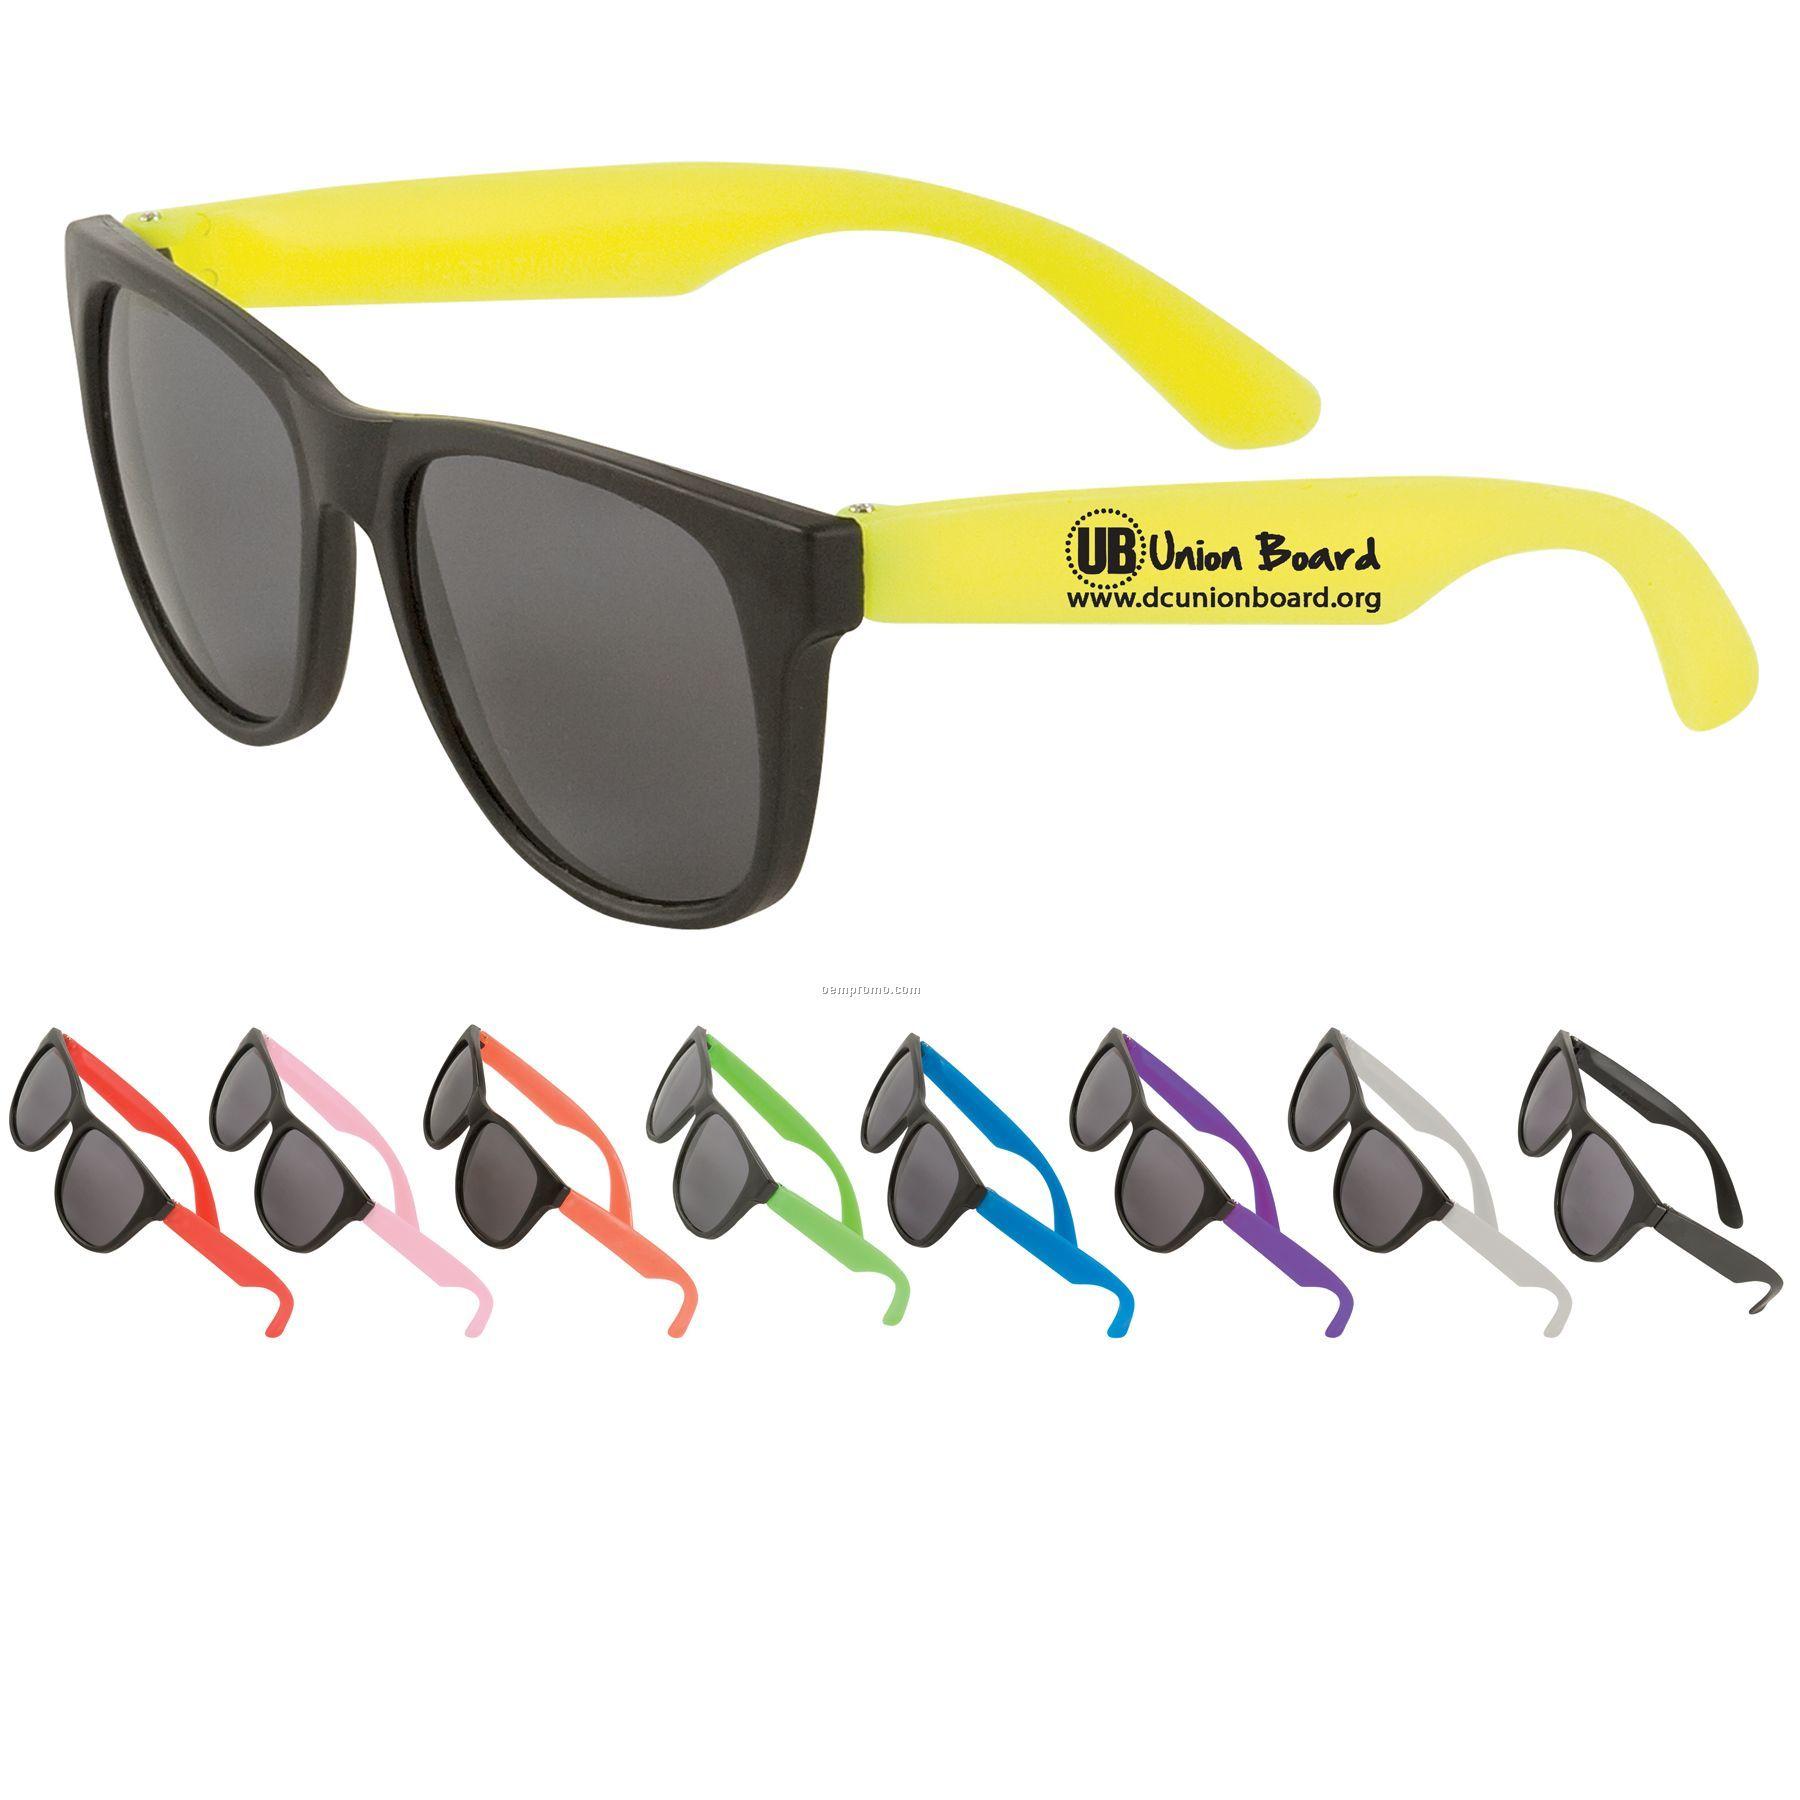 389b8c2600 Plastic Colored Sunglasses In Bulk